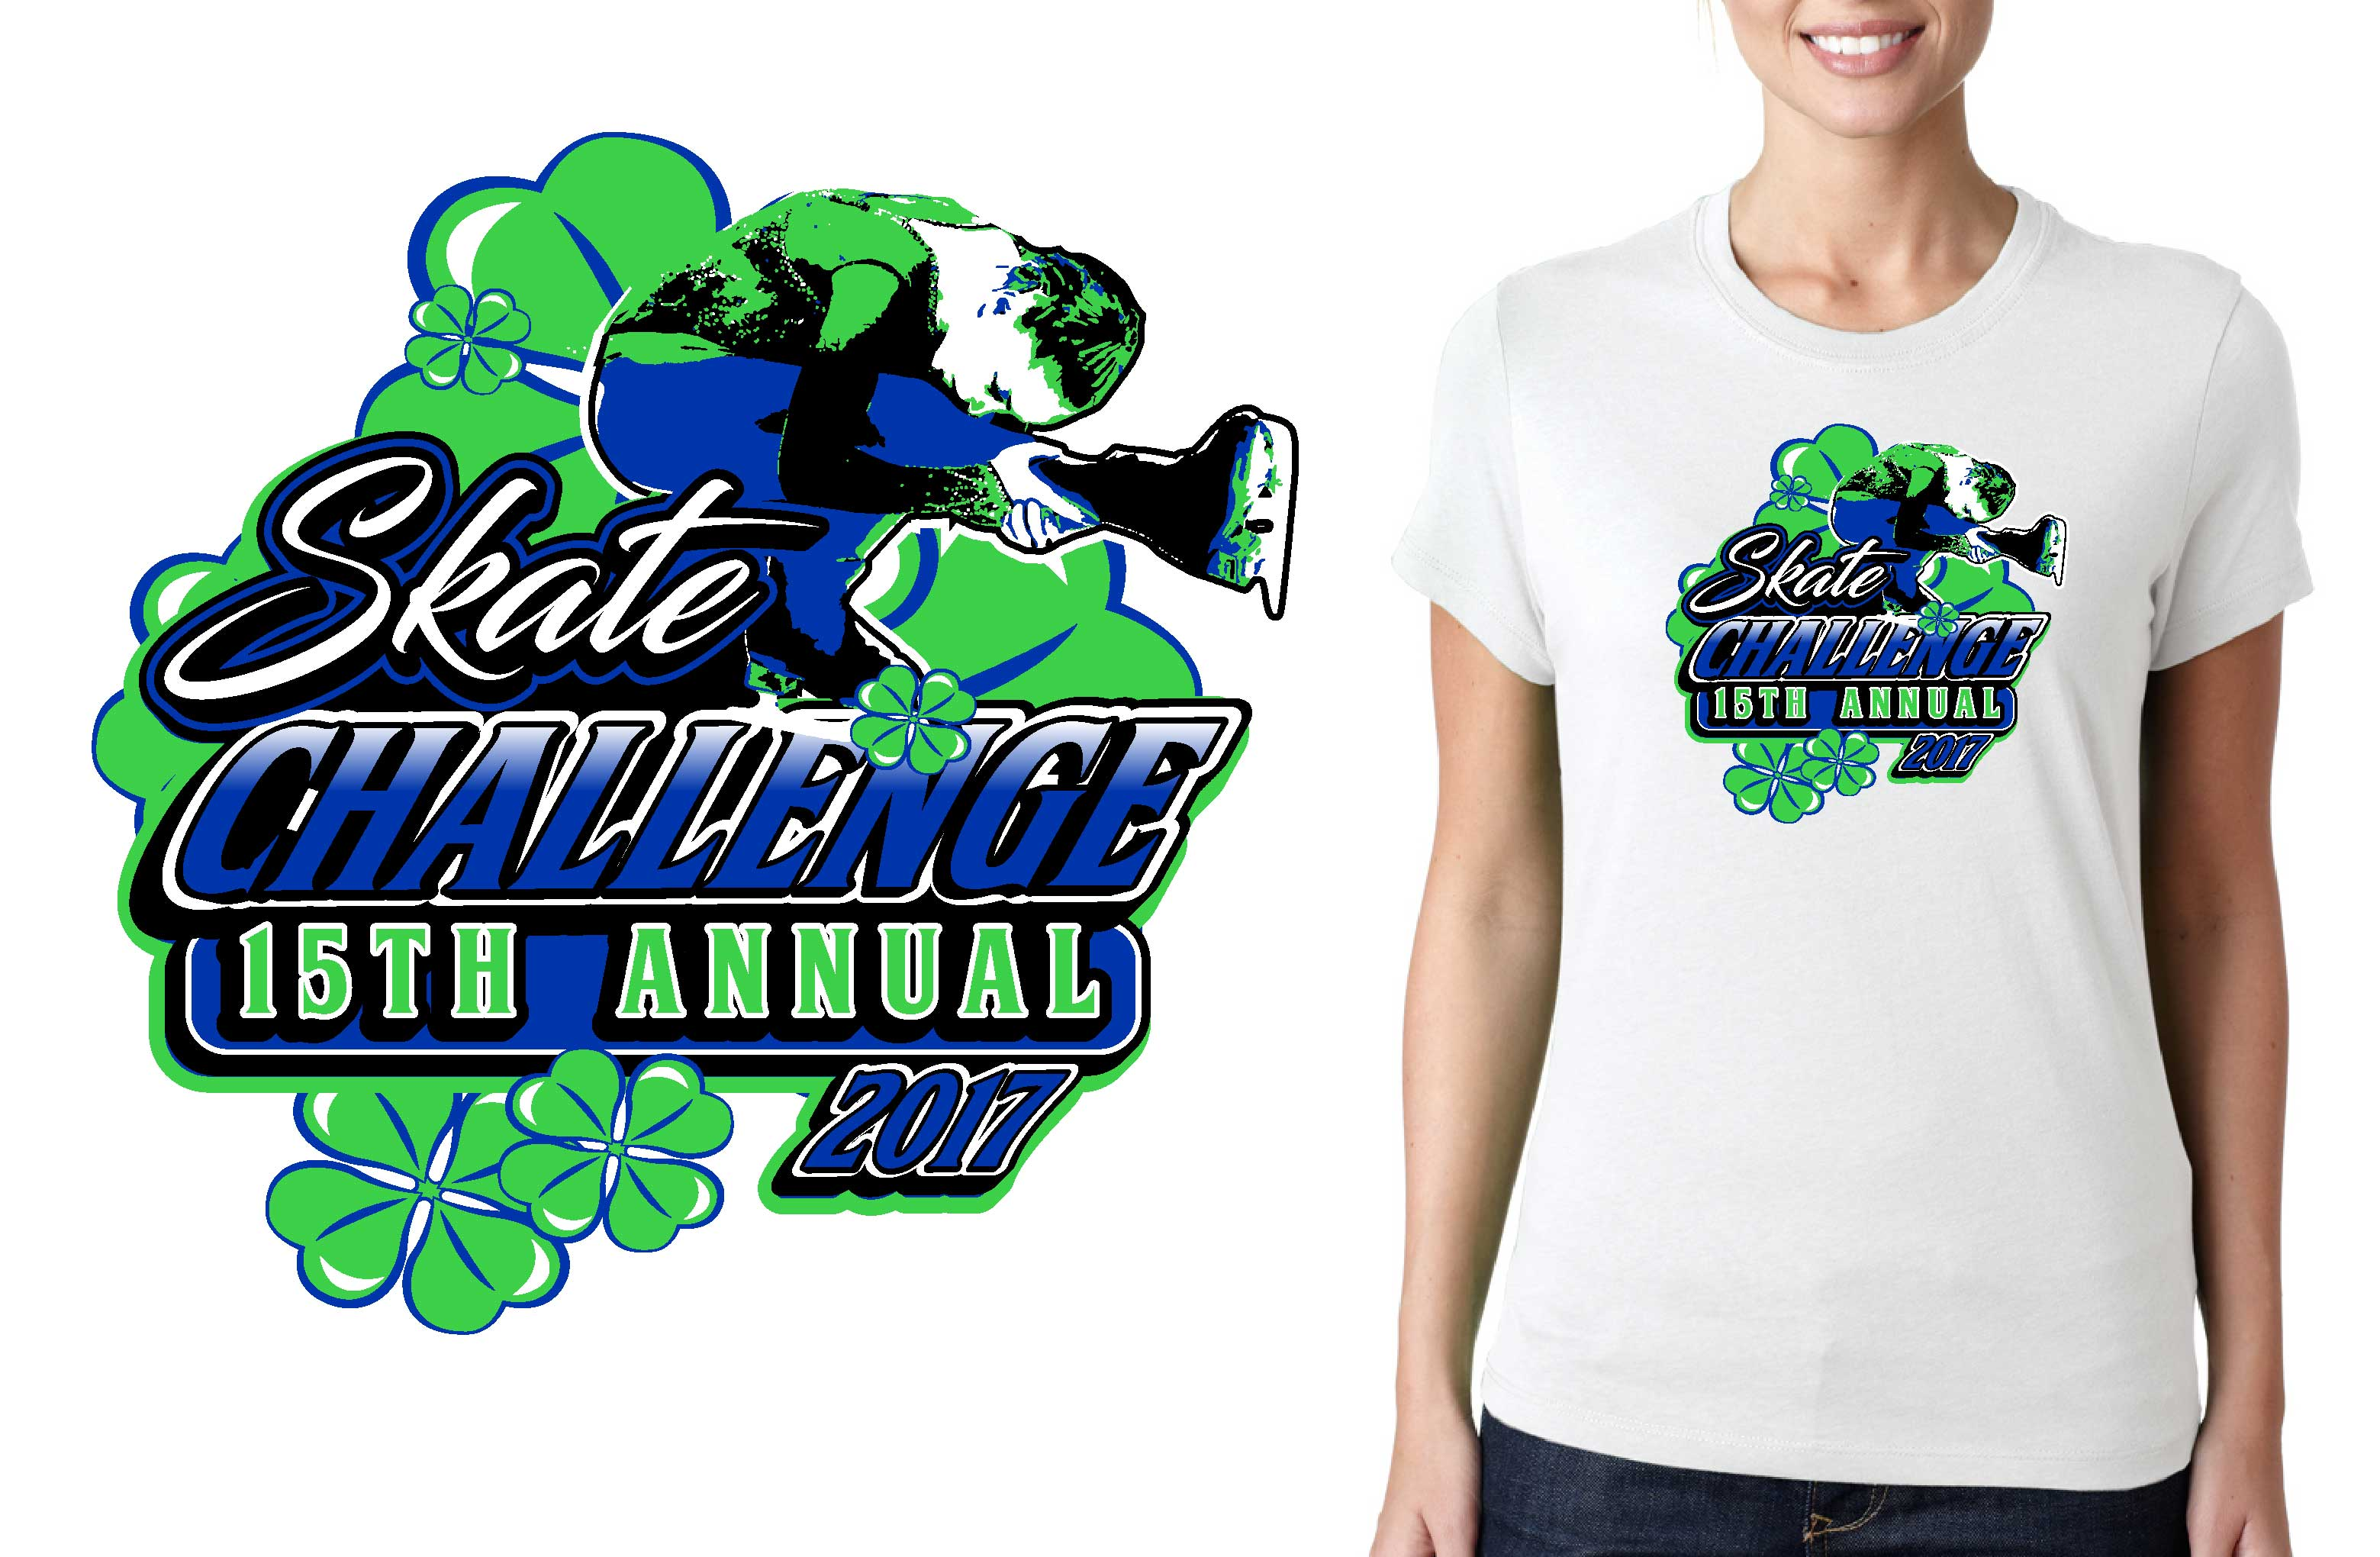 3119x2040 2017 15th Annual Skate Challenge Vector Logo Design For Figure